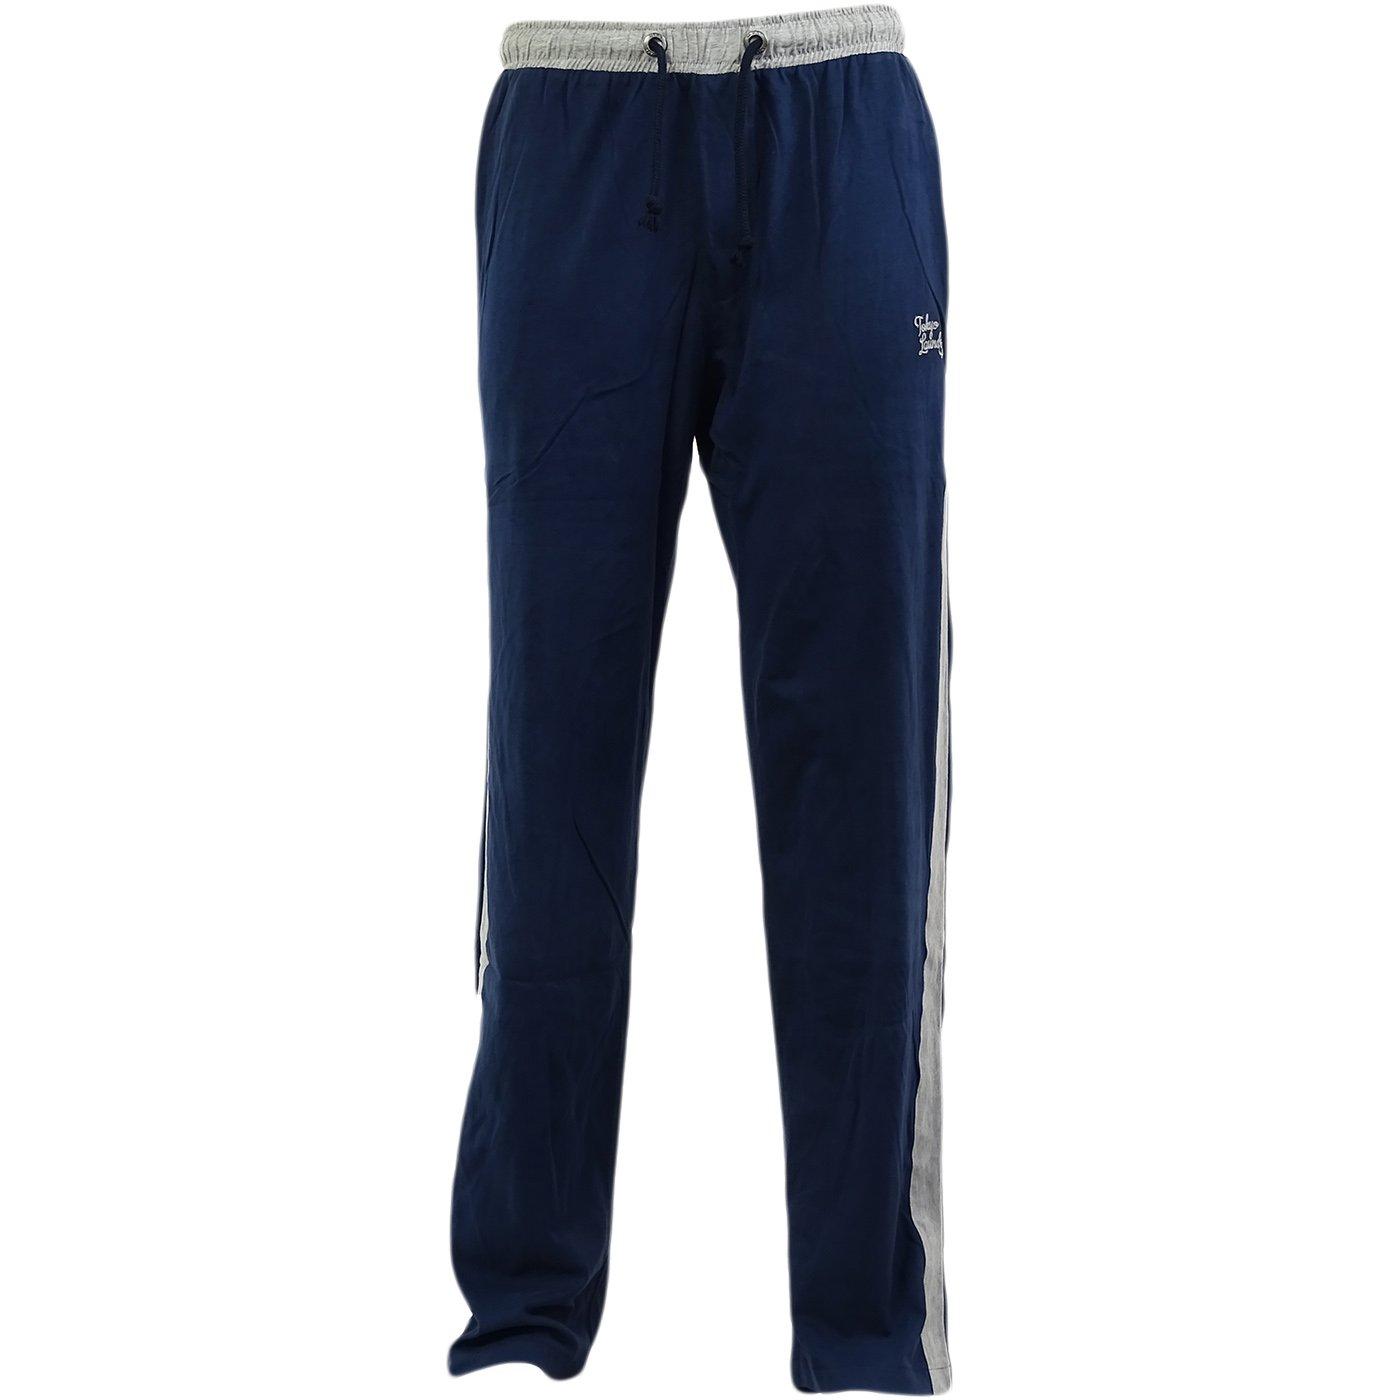 Tokyo Laundry Lightweight, Straight Leg Pyjama Bottom 8113 Blue S